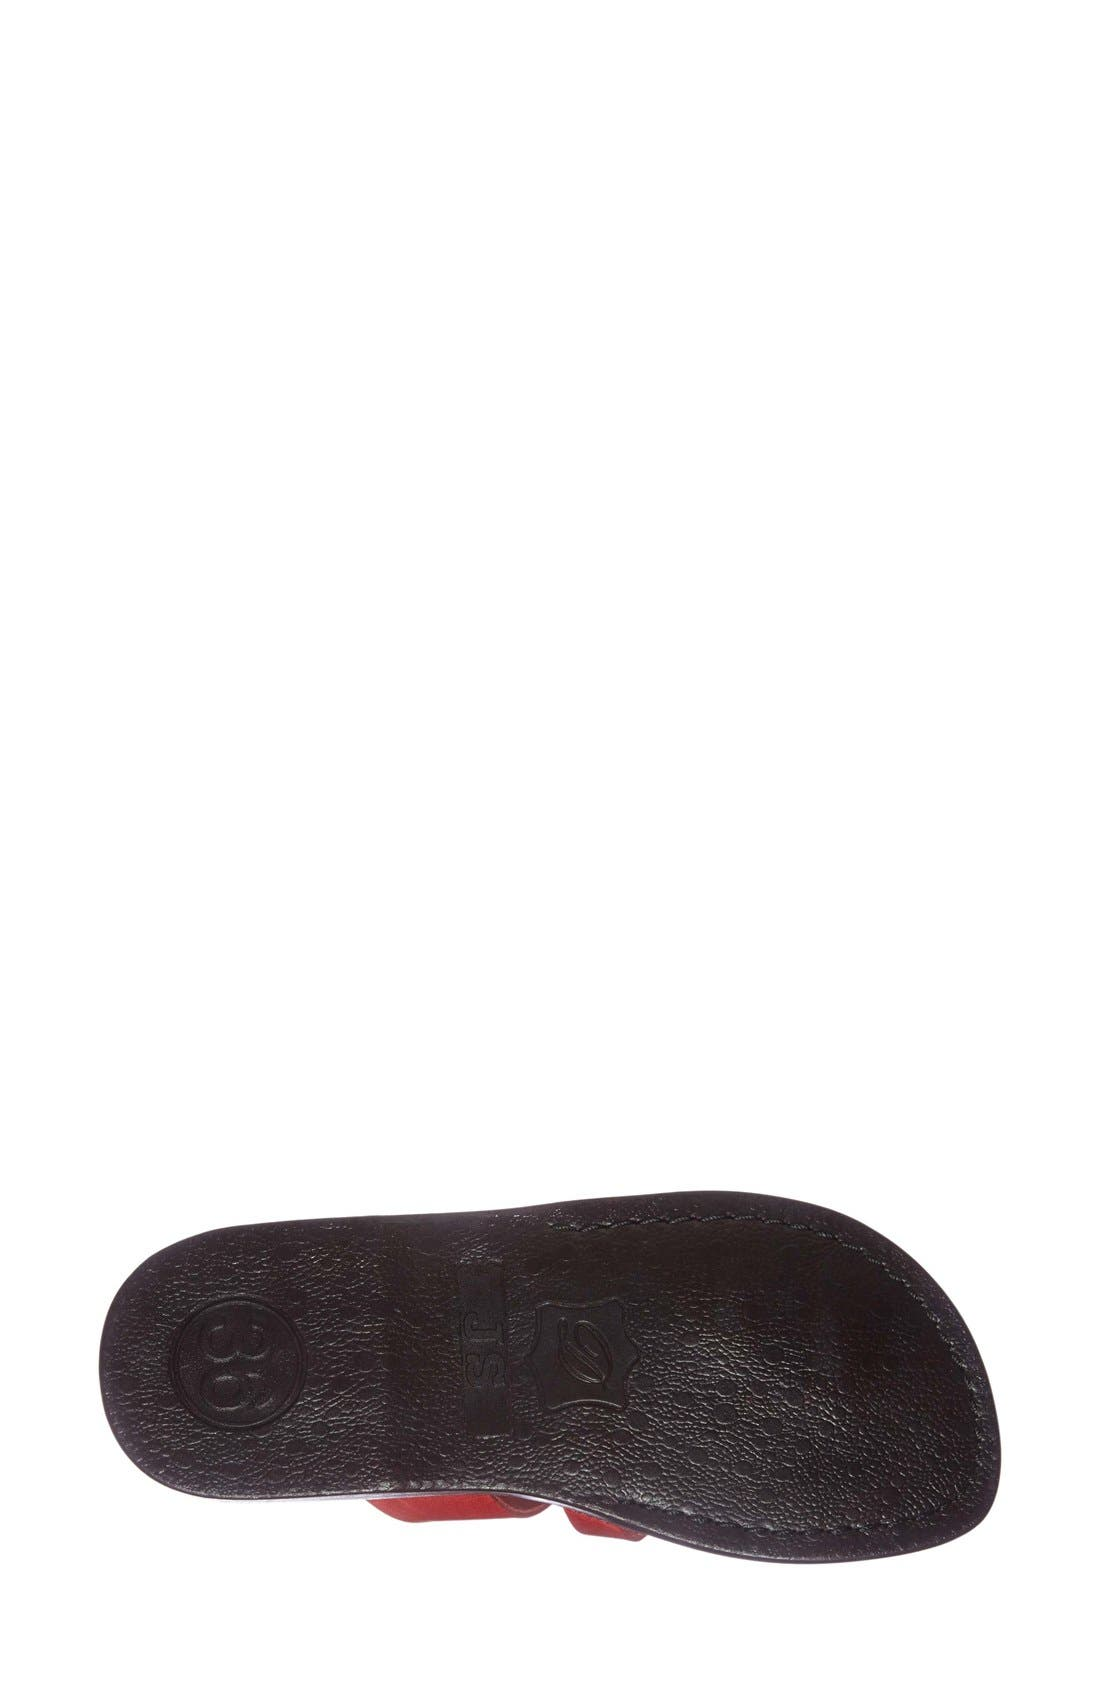 'The Good Shepard' Leather Sandal,                             Alternate thumbnail 31, color,